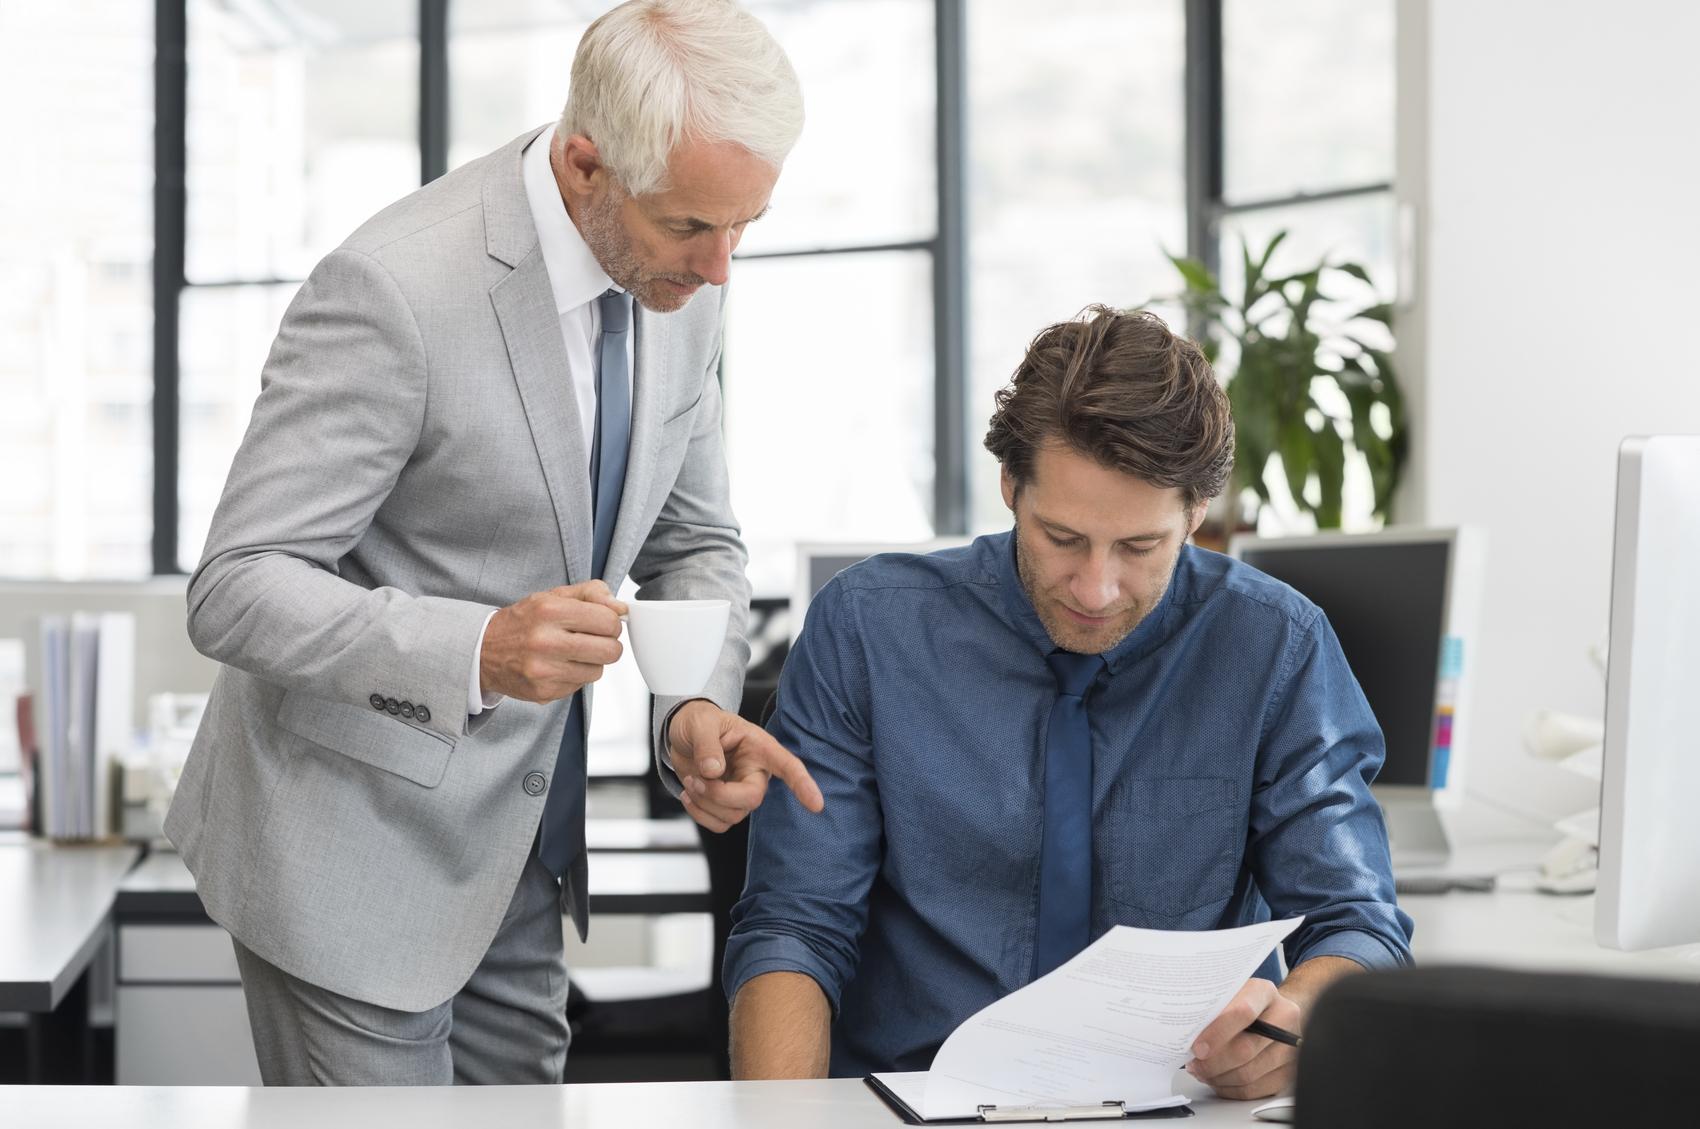 Stock photo of an elder businessman guiding a younger businessman